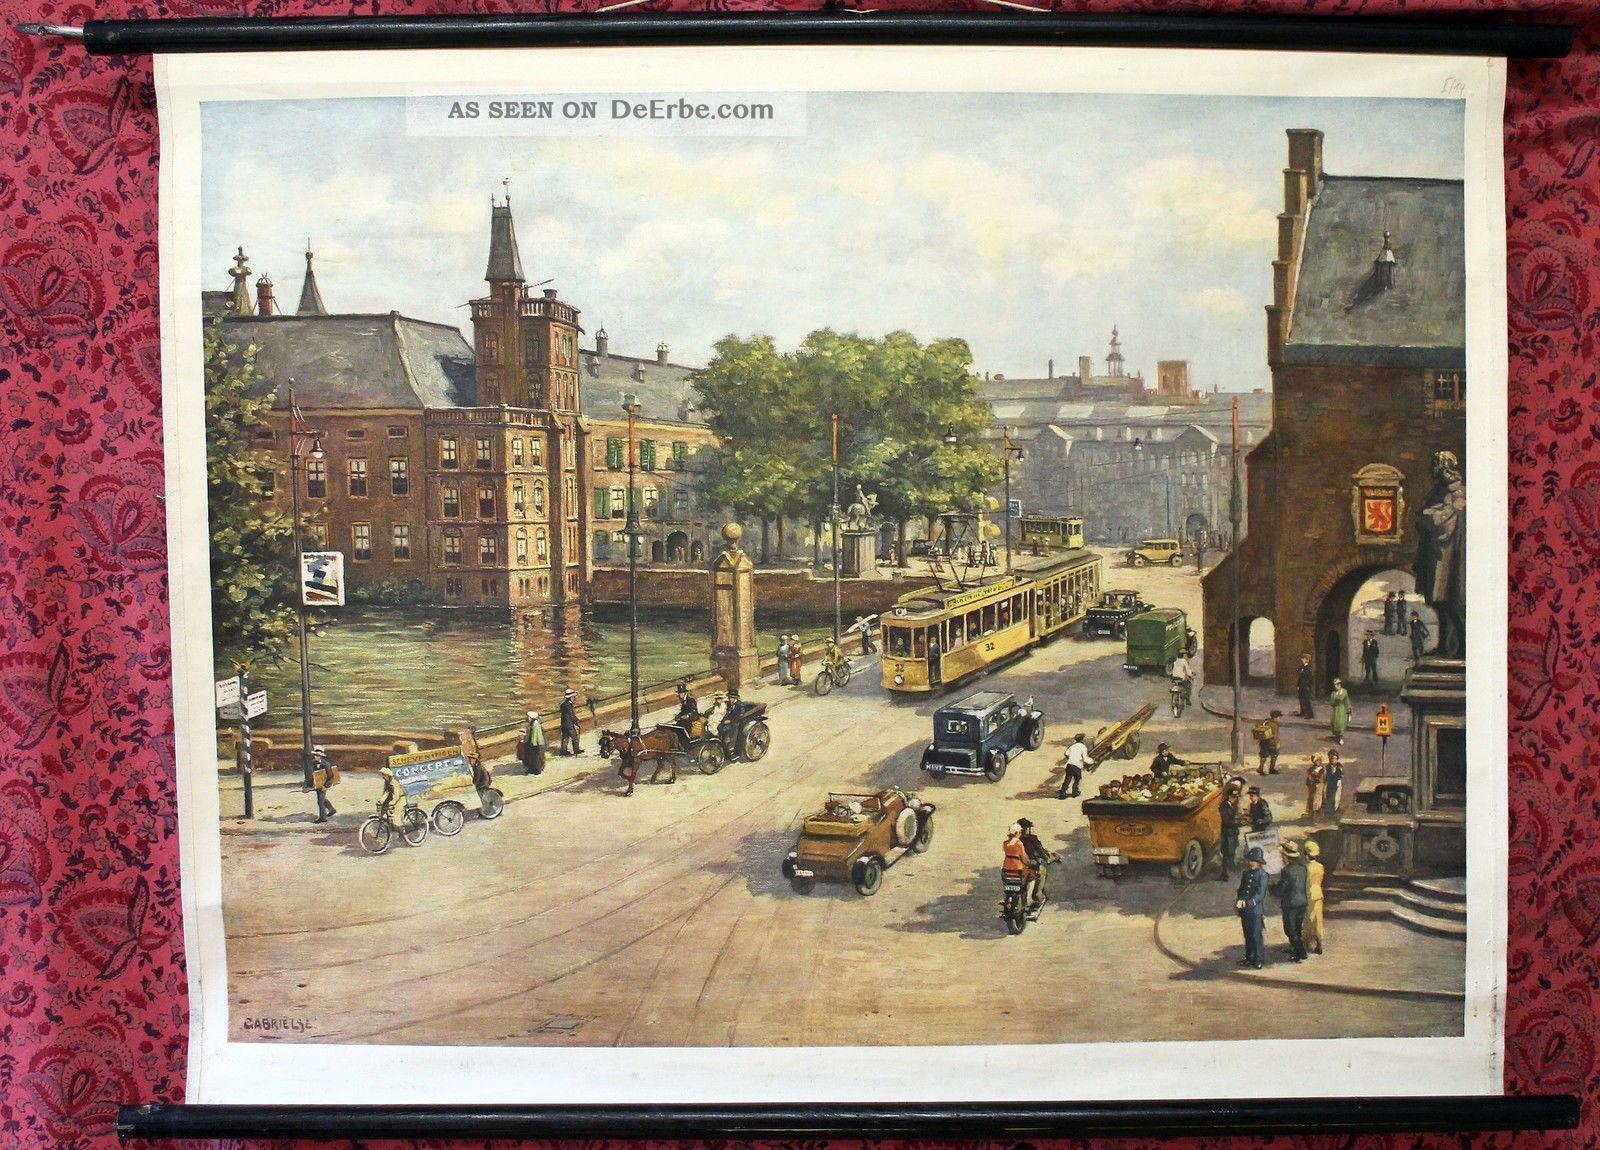 Schulwandkarte Den Haag City Innenstadt Wandtafel Ca.  1955 87x66cm Arzt & Apotheker Bild